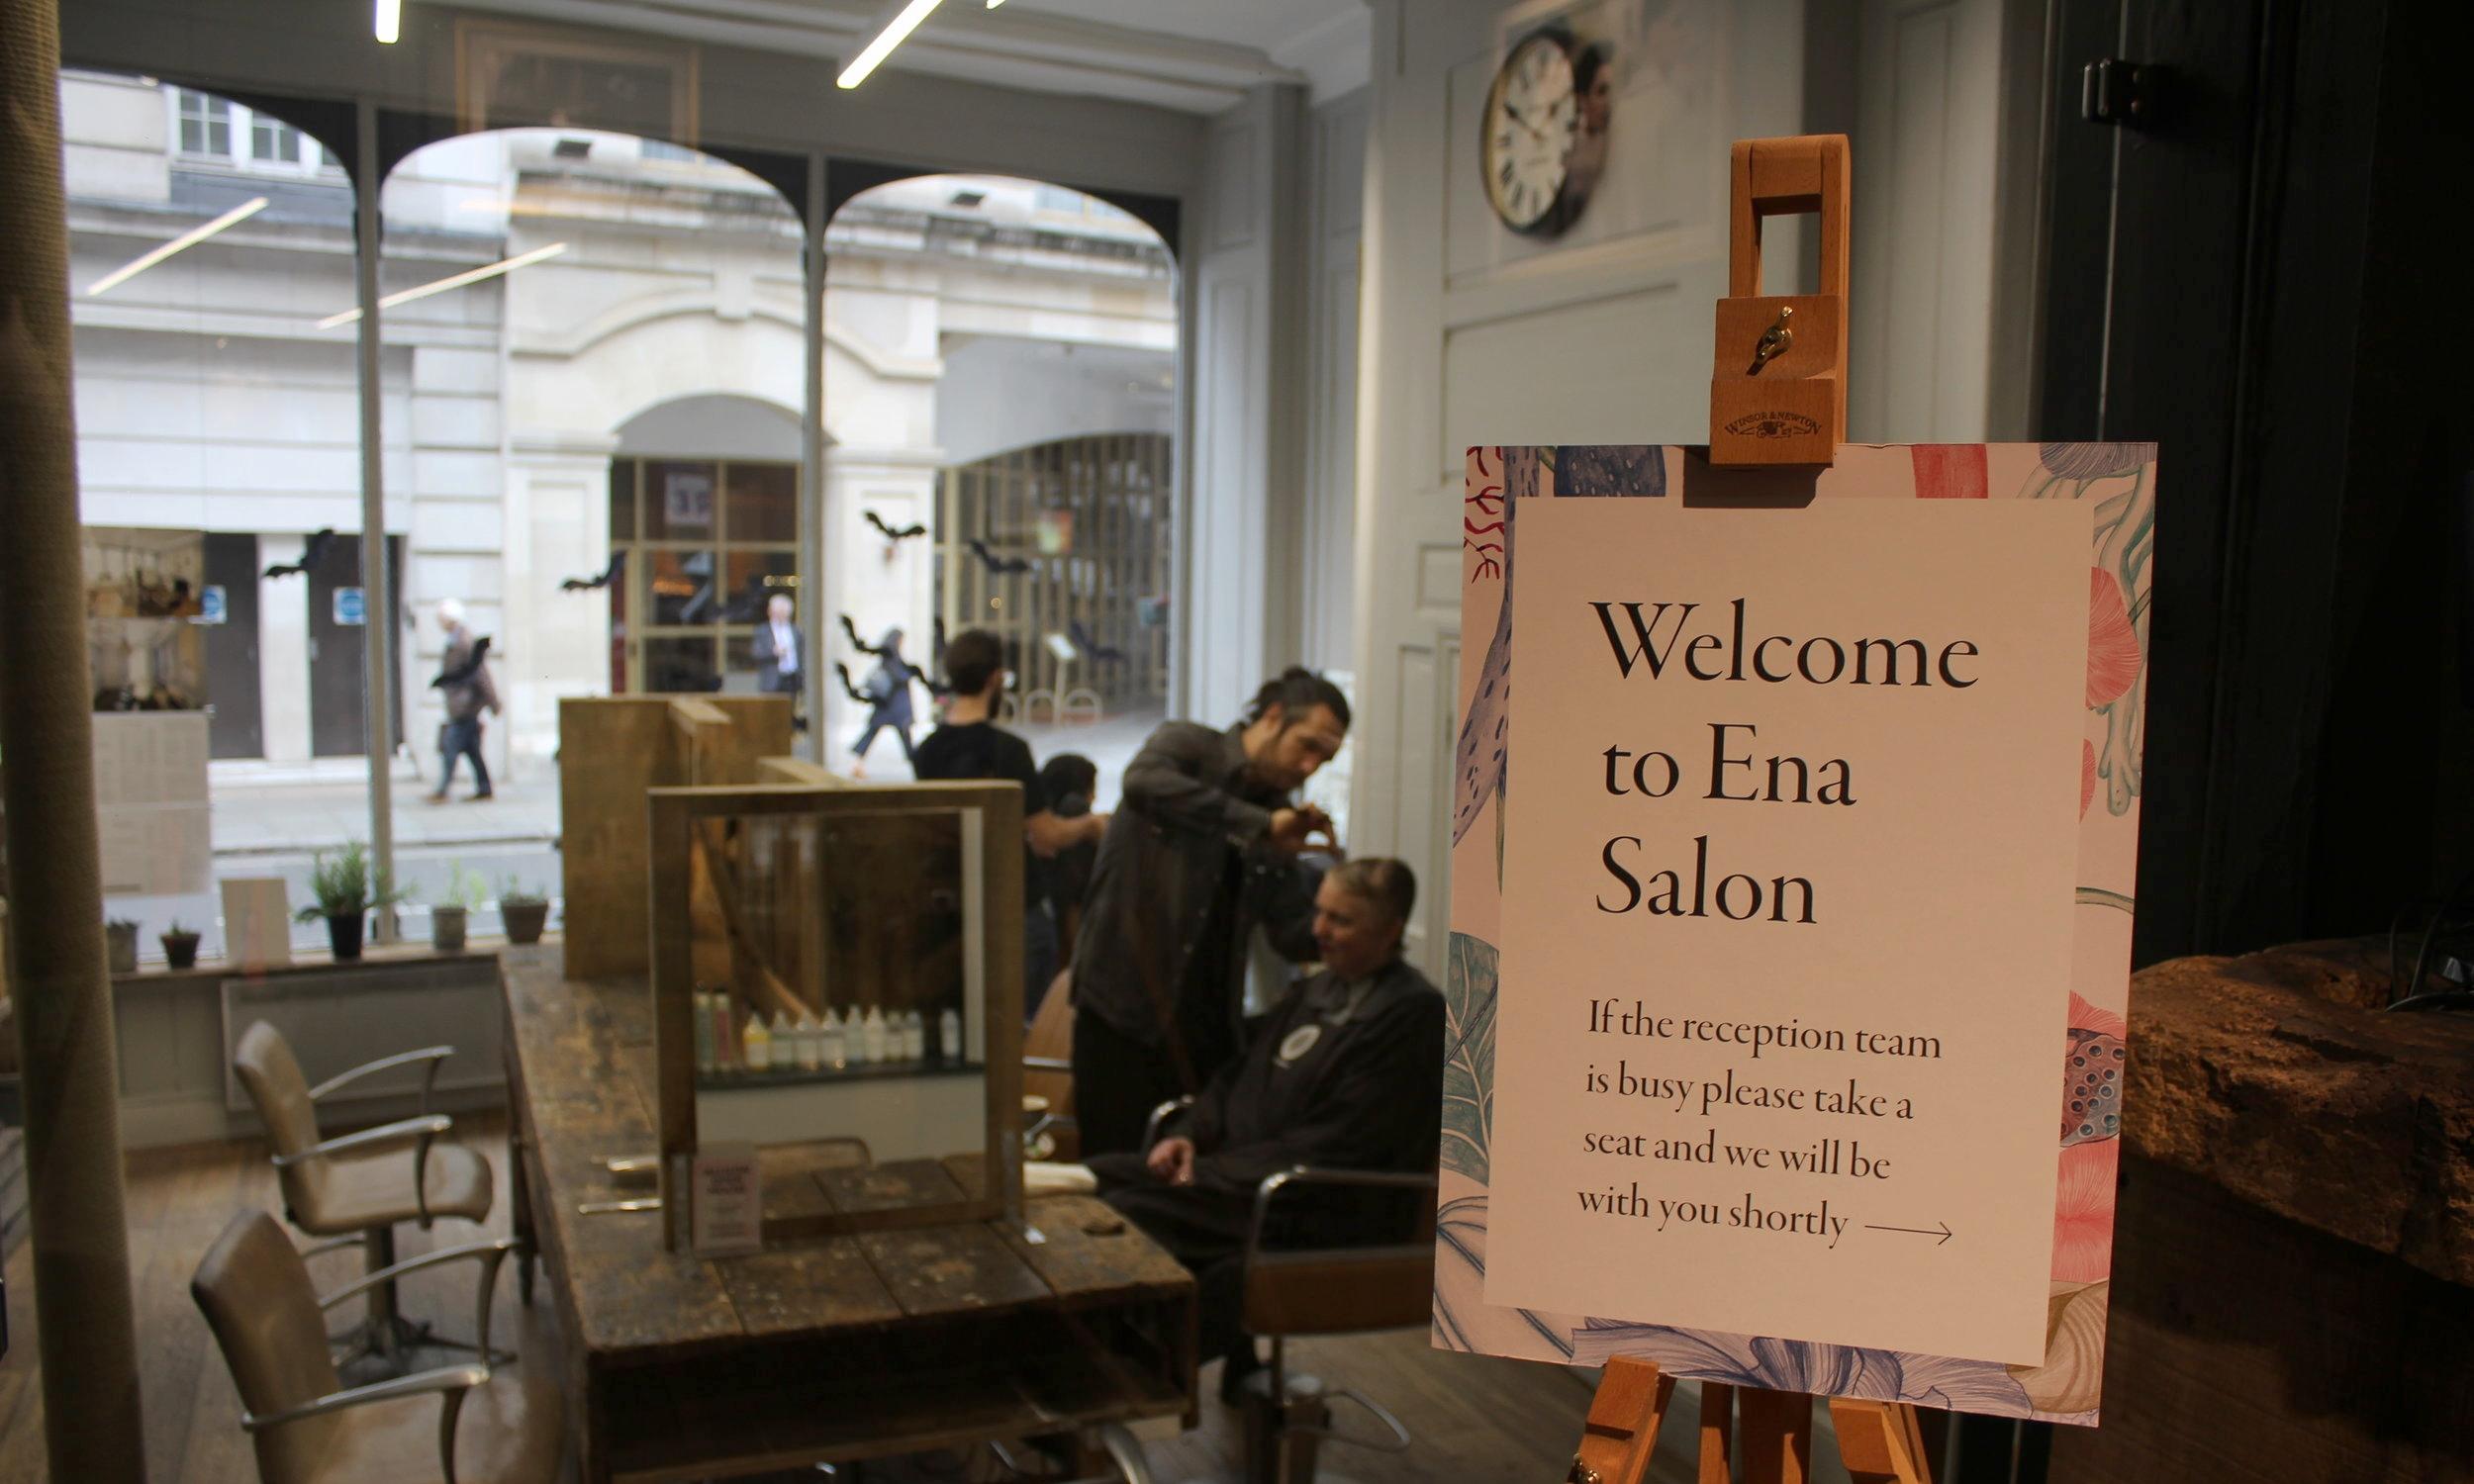 Stylists working their magic at Ena Salon